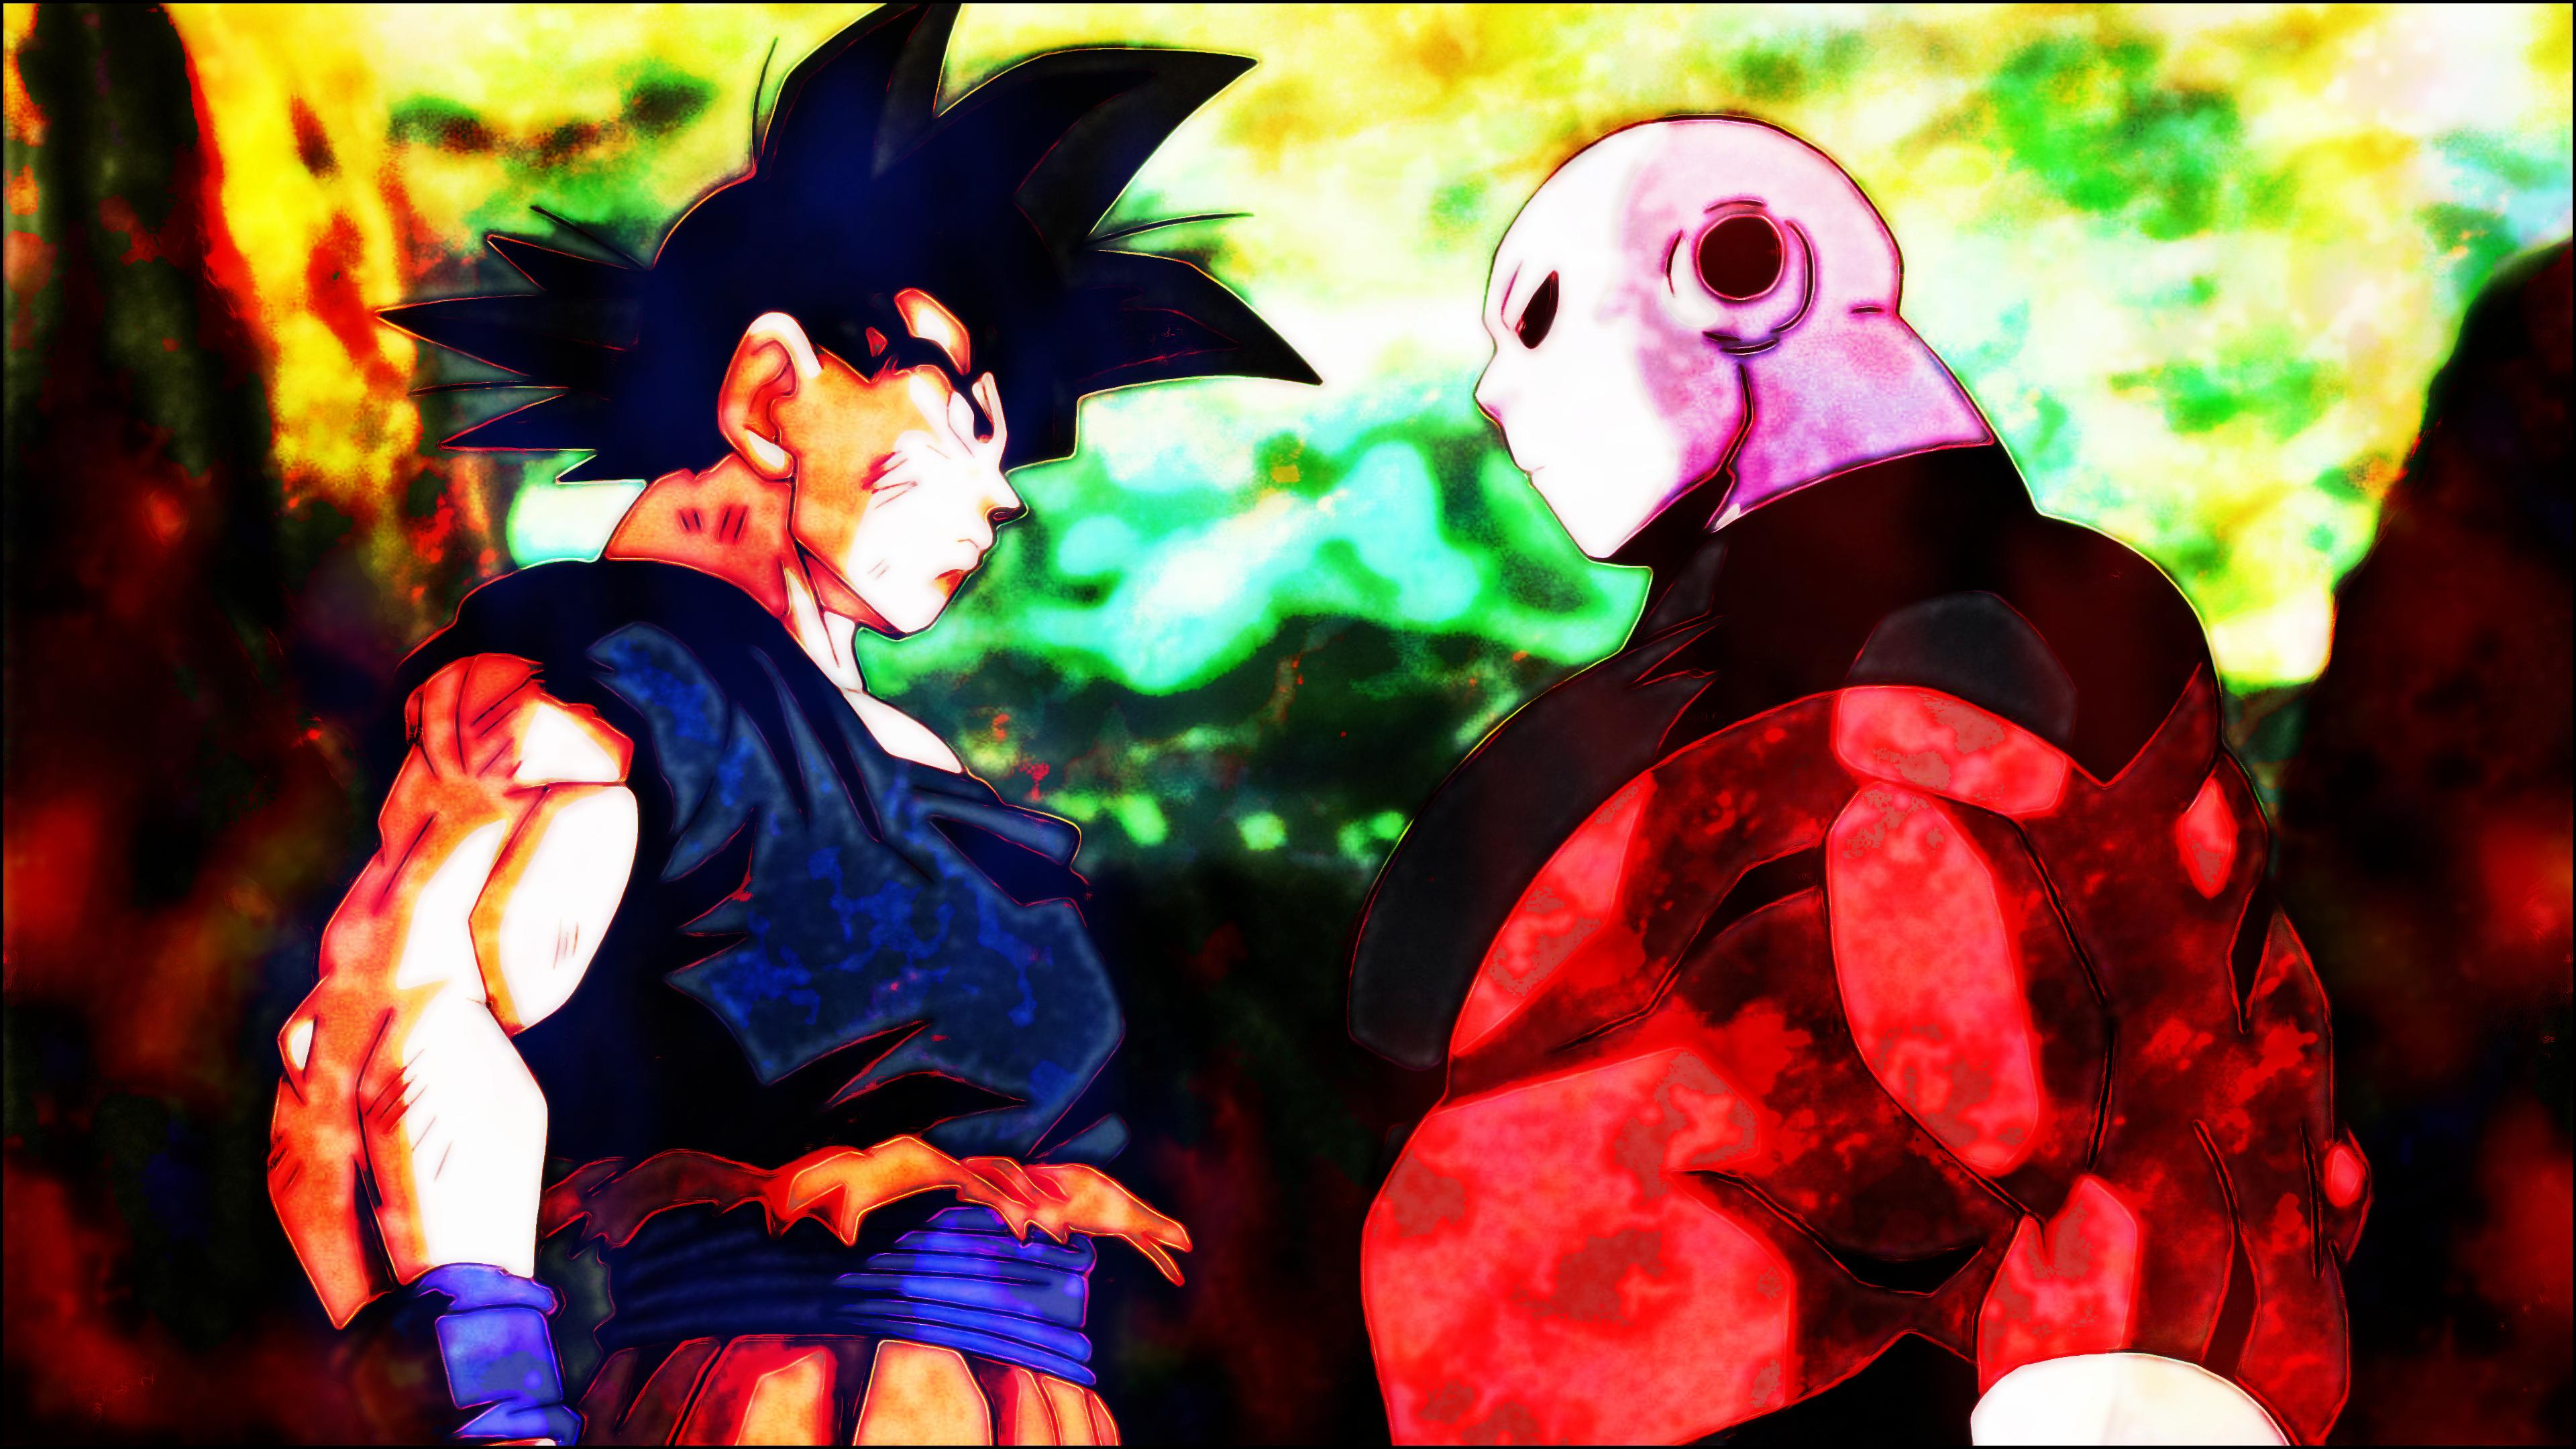 Anime 3840x2160 jiren the gray jiren Son Goku Dragon Ball Dragon Ball Super brightness Super Saiyan God Ultra-Instinct Goku